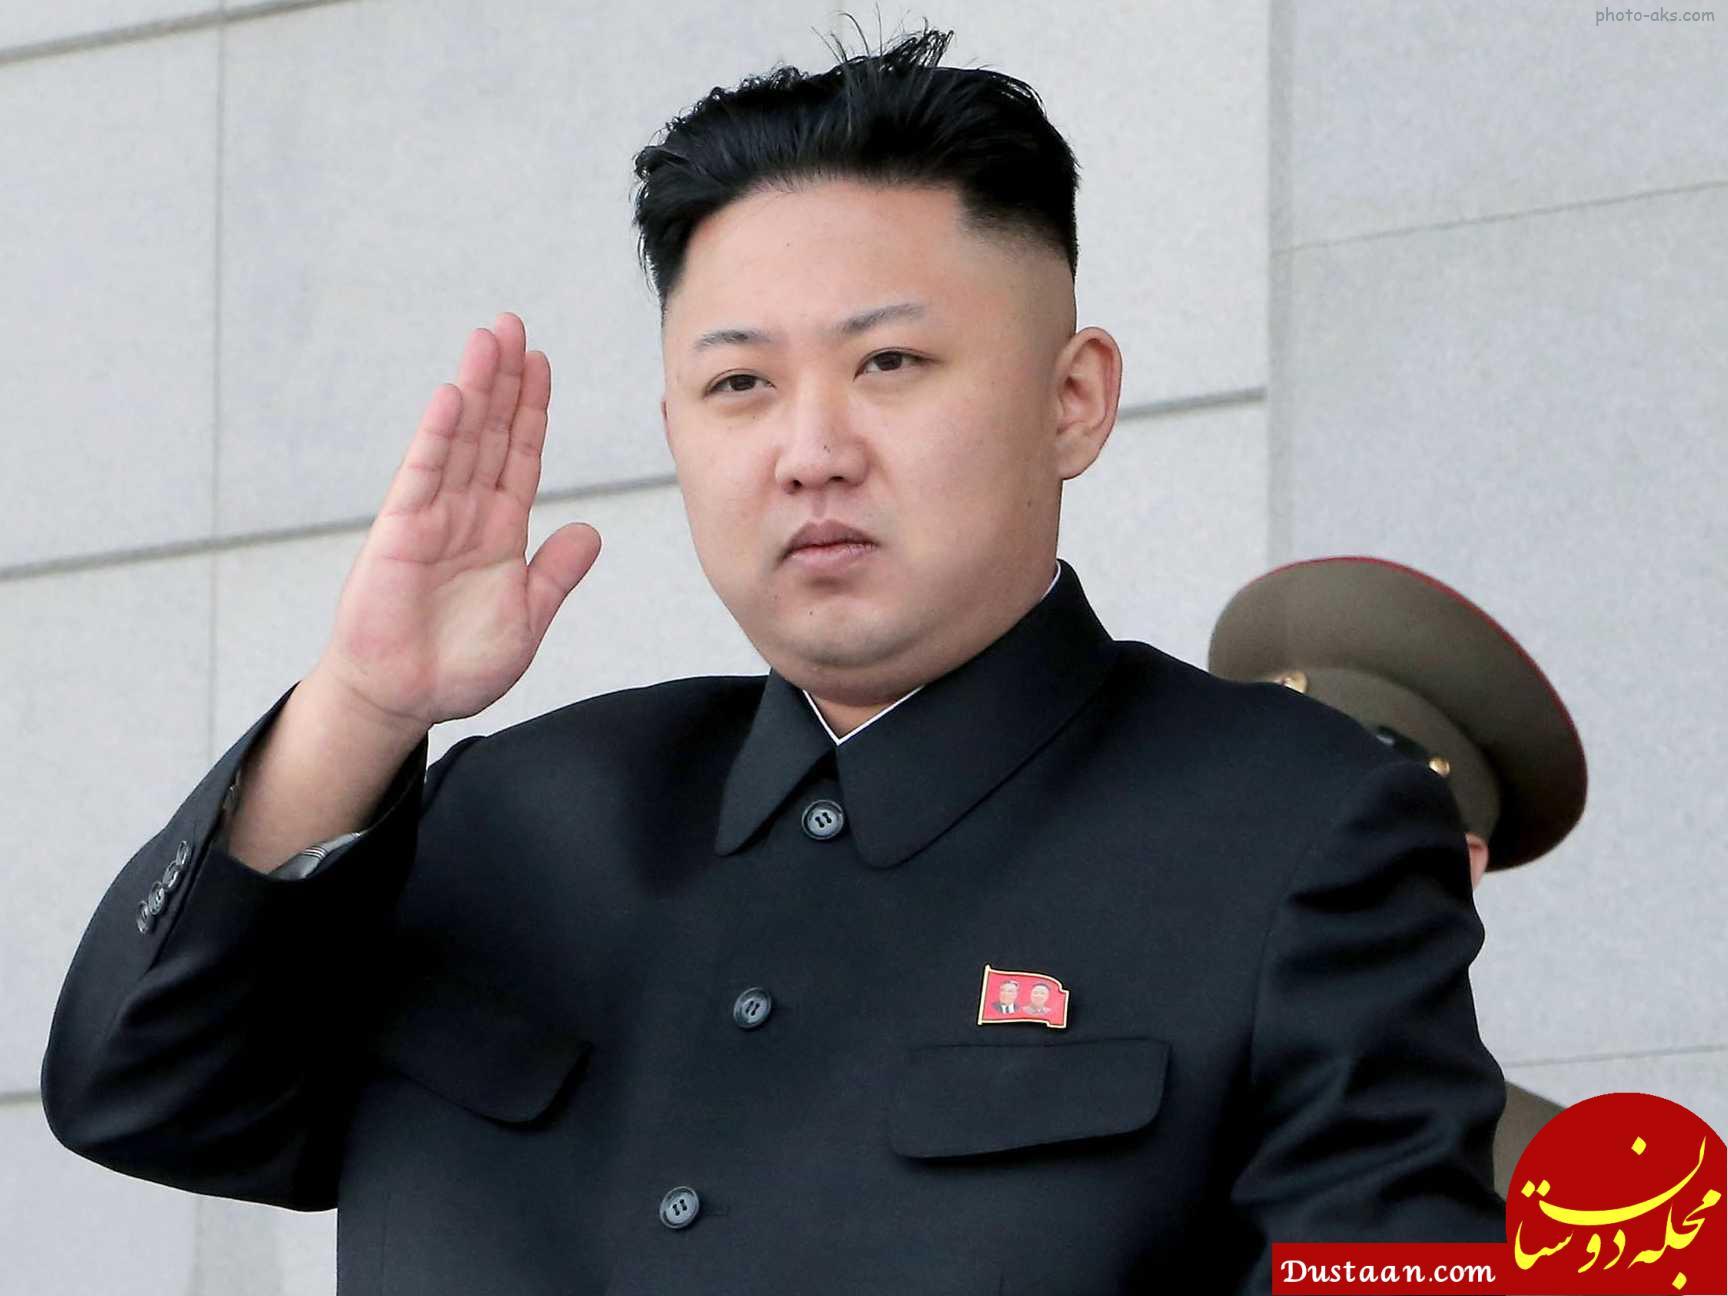 www.dustaan.com وحشت عجیب رهبر کره شمالی از آرایشگران! +عکس